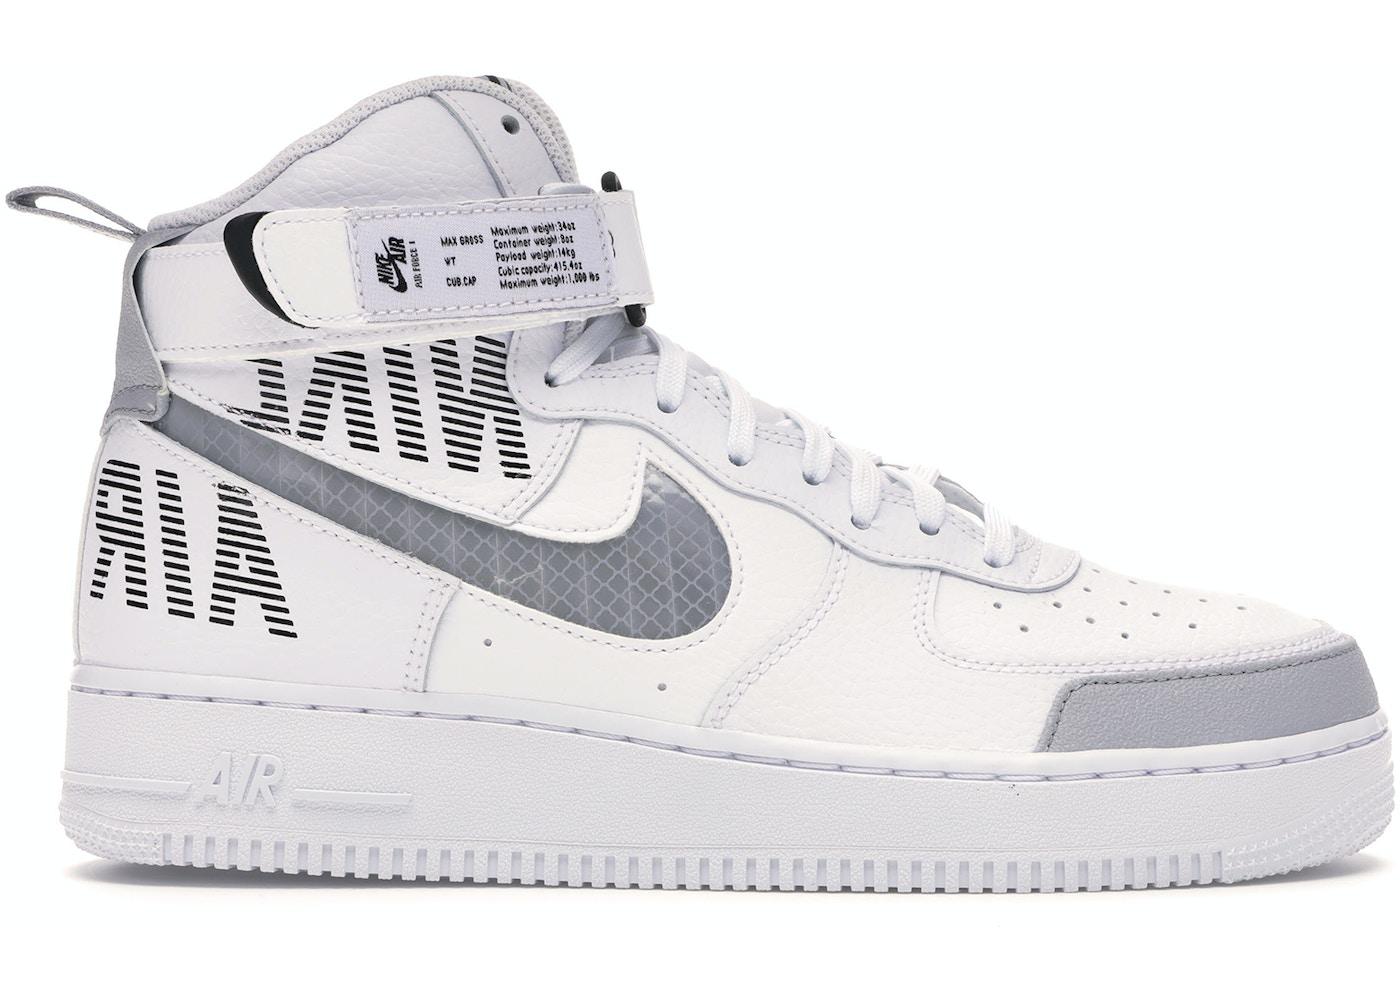 Nike Air Force 1 High Under Construction White Cq0449 100